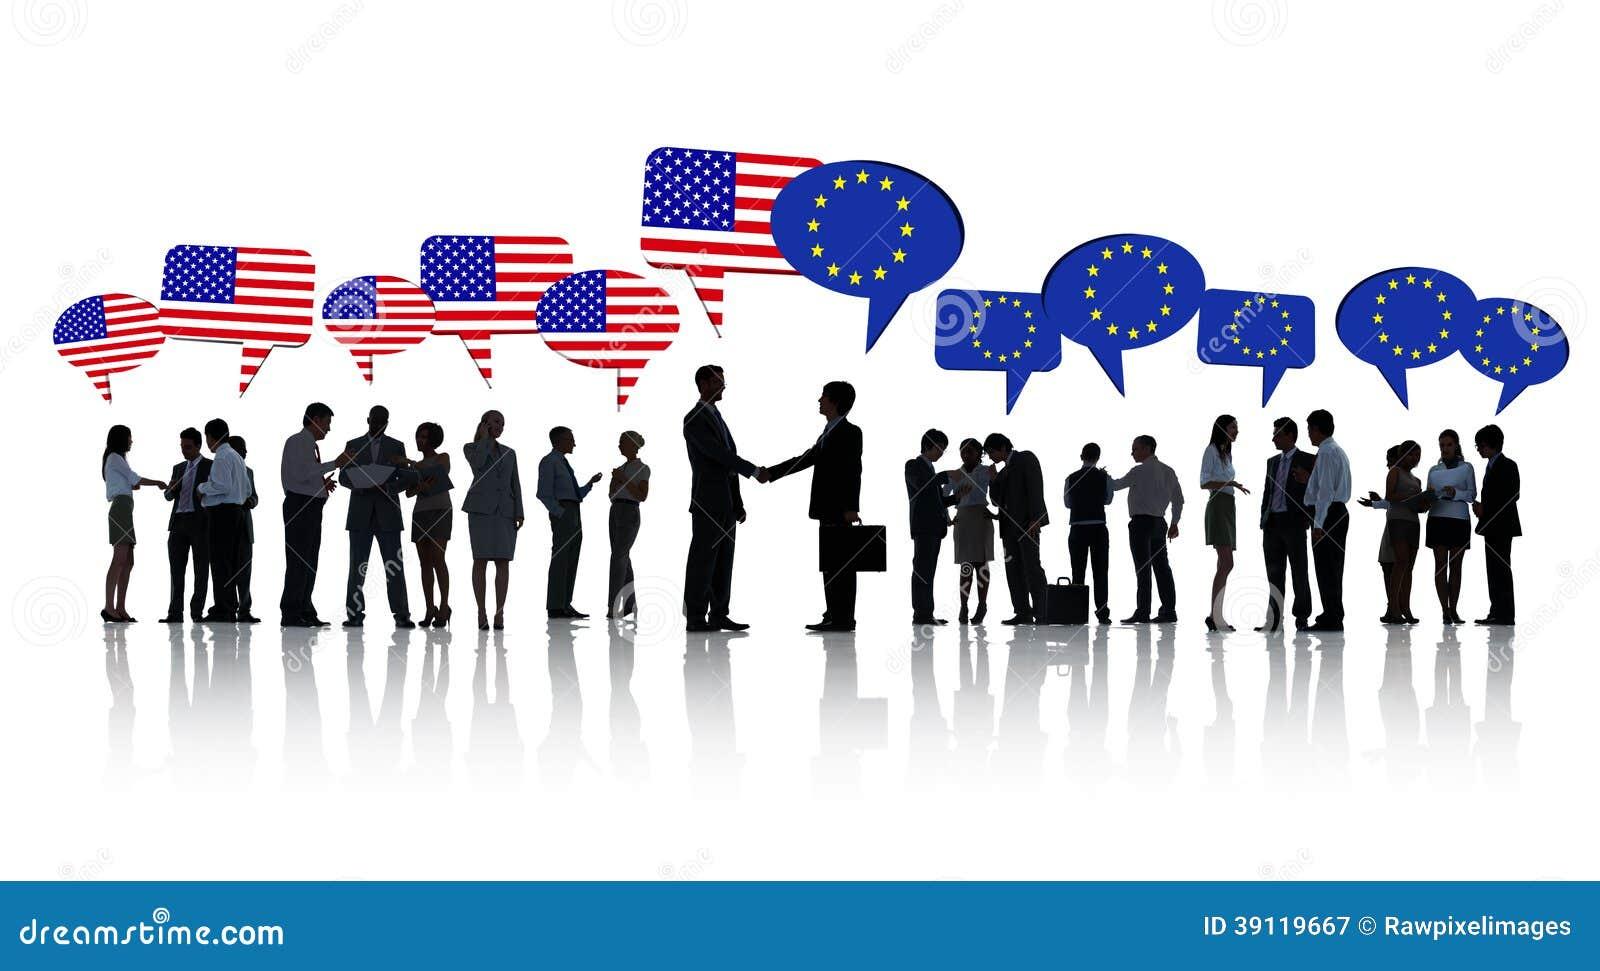 American european group photo 135